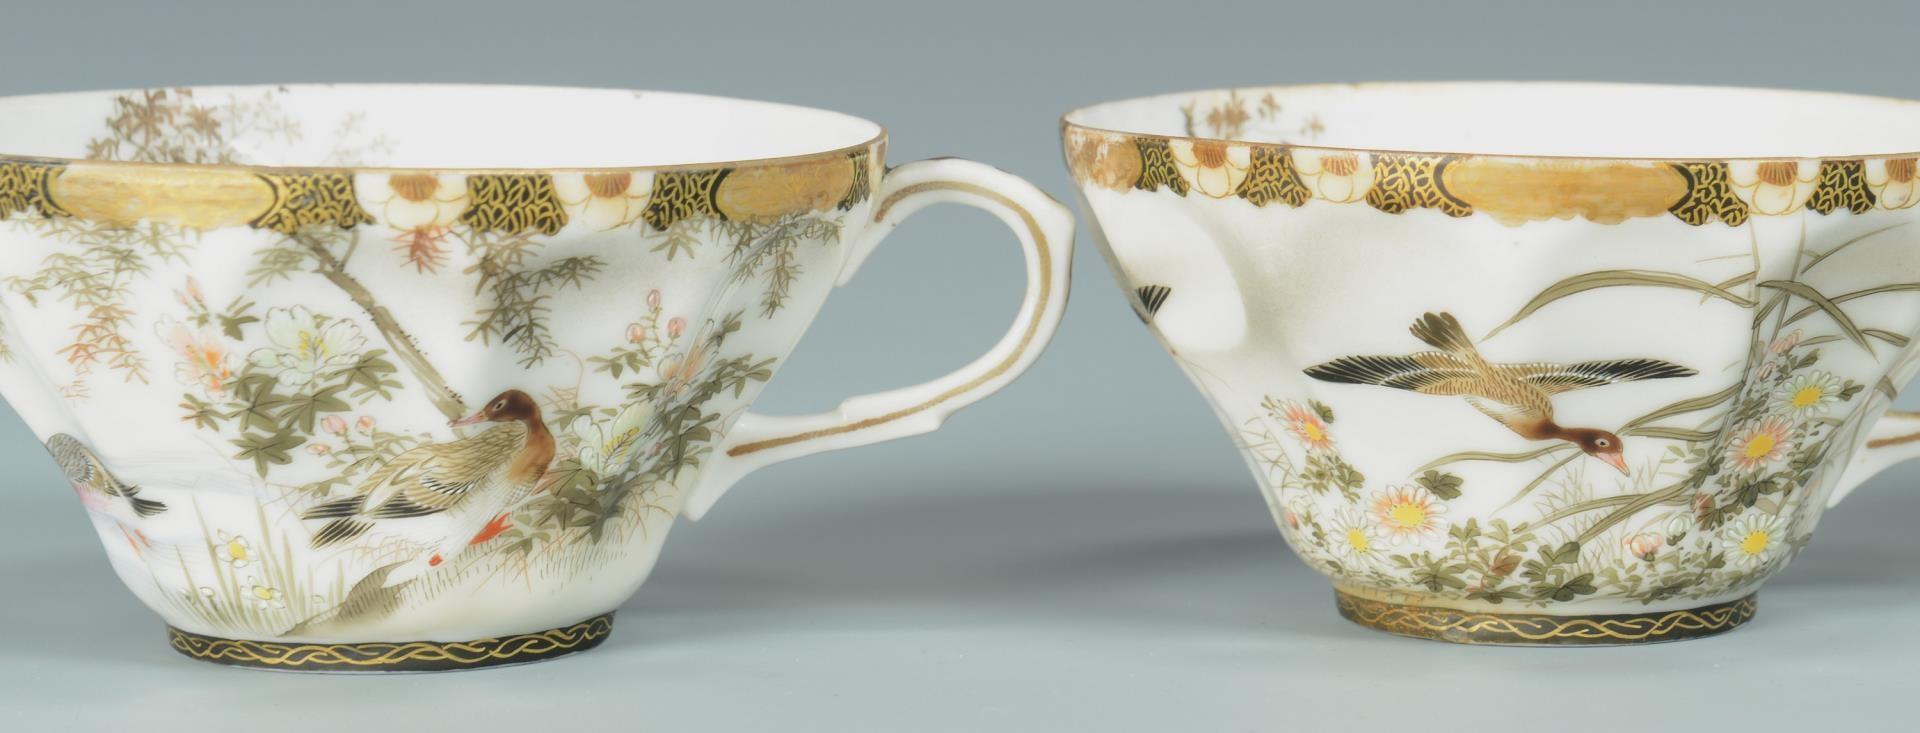 Lot 3594241: 19th c. Japanese Porcelain Set, Birds